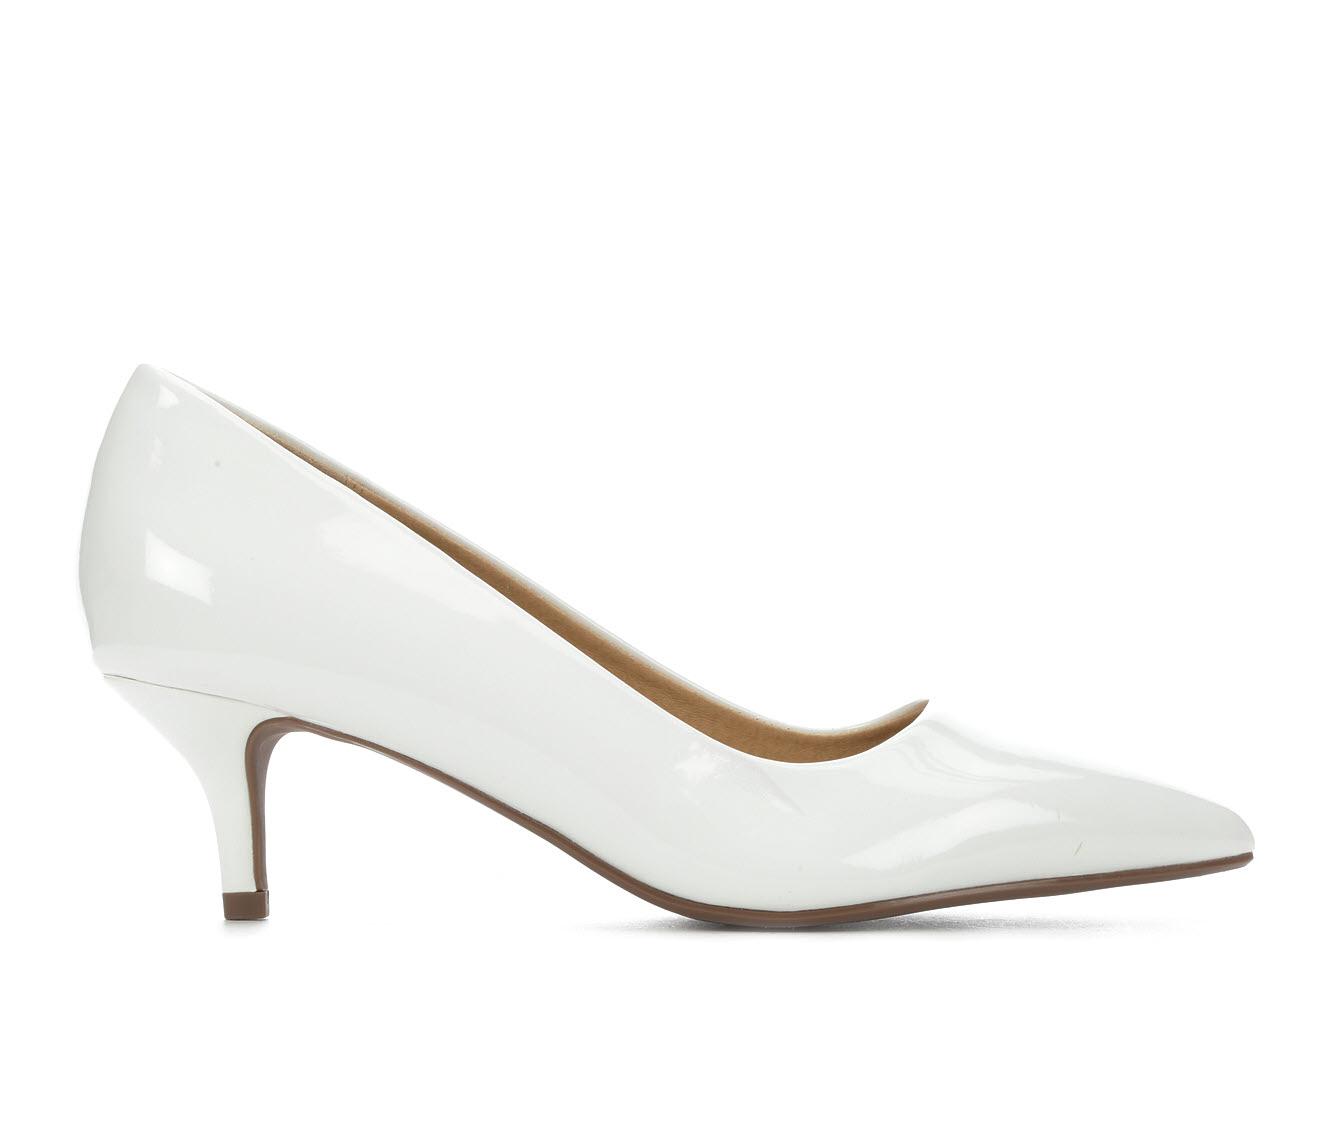 City Classified Hailey Women's Dress Shoe (White Faux Leather)